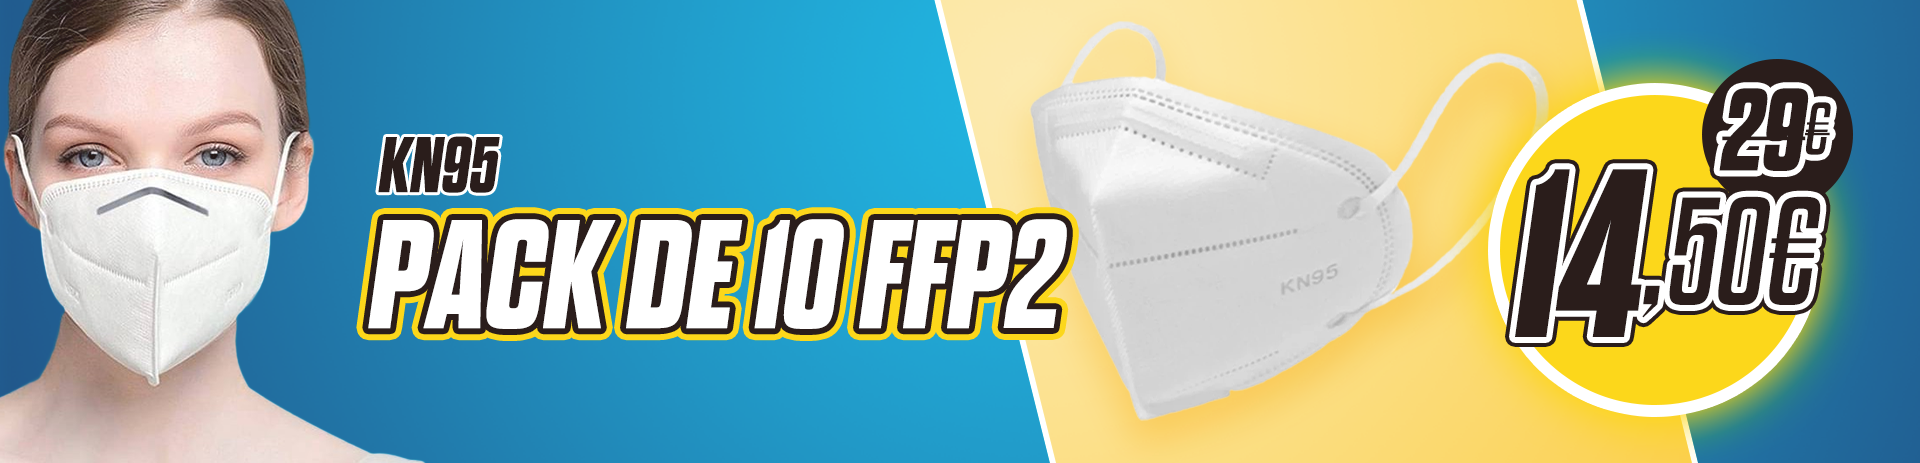 Ofertas Mascarillas FFP2 en Guanxe.com